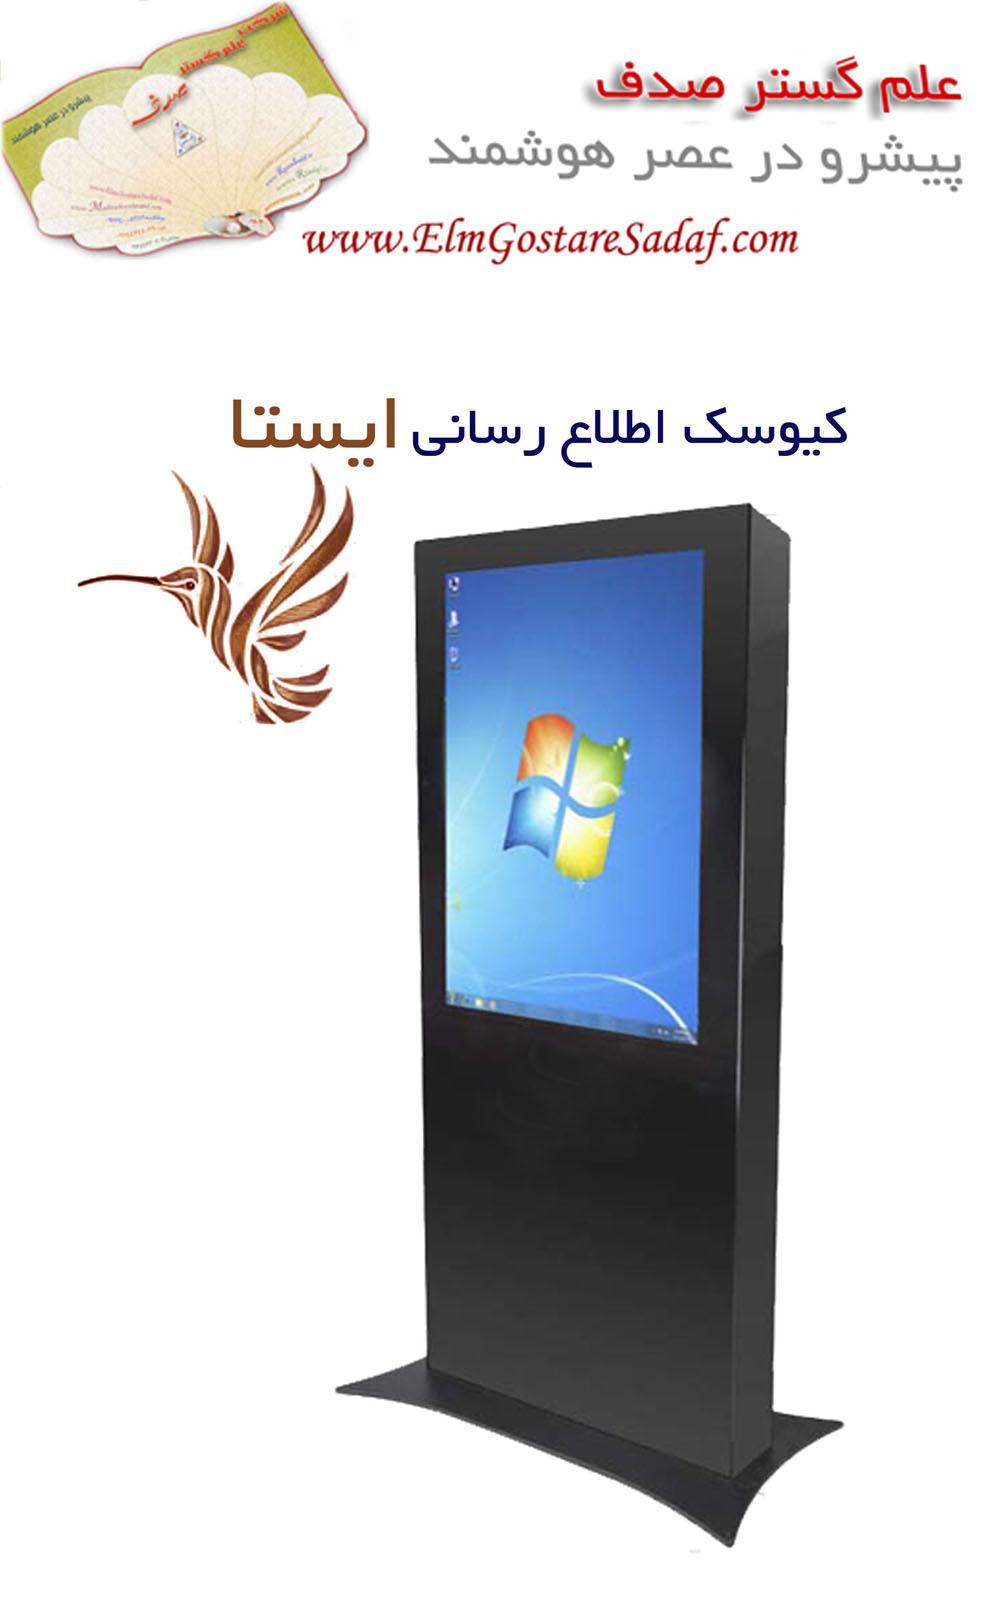 كيوسك اطلاع رساني ويژه نمايش